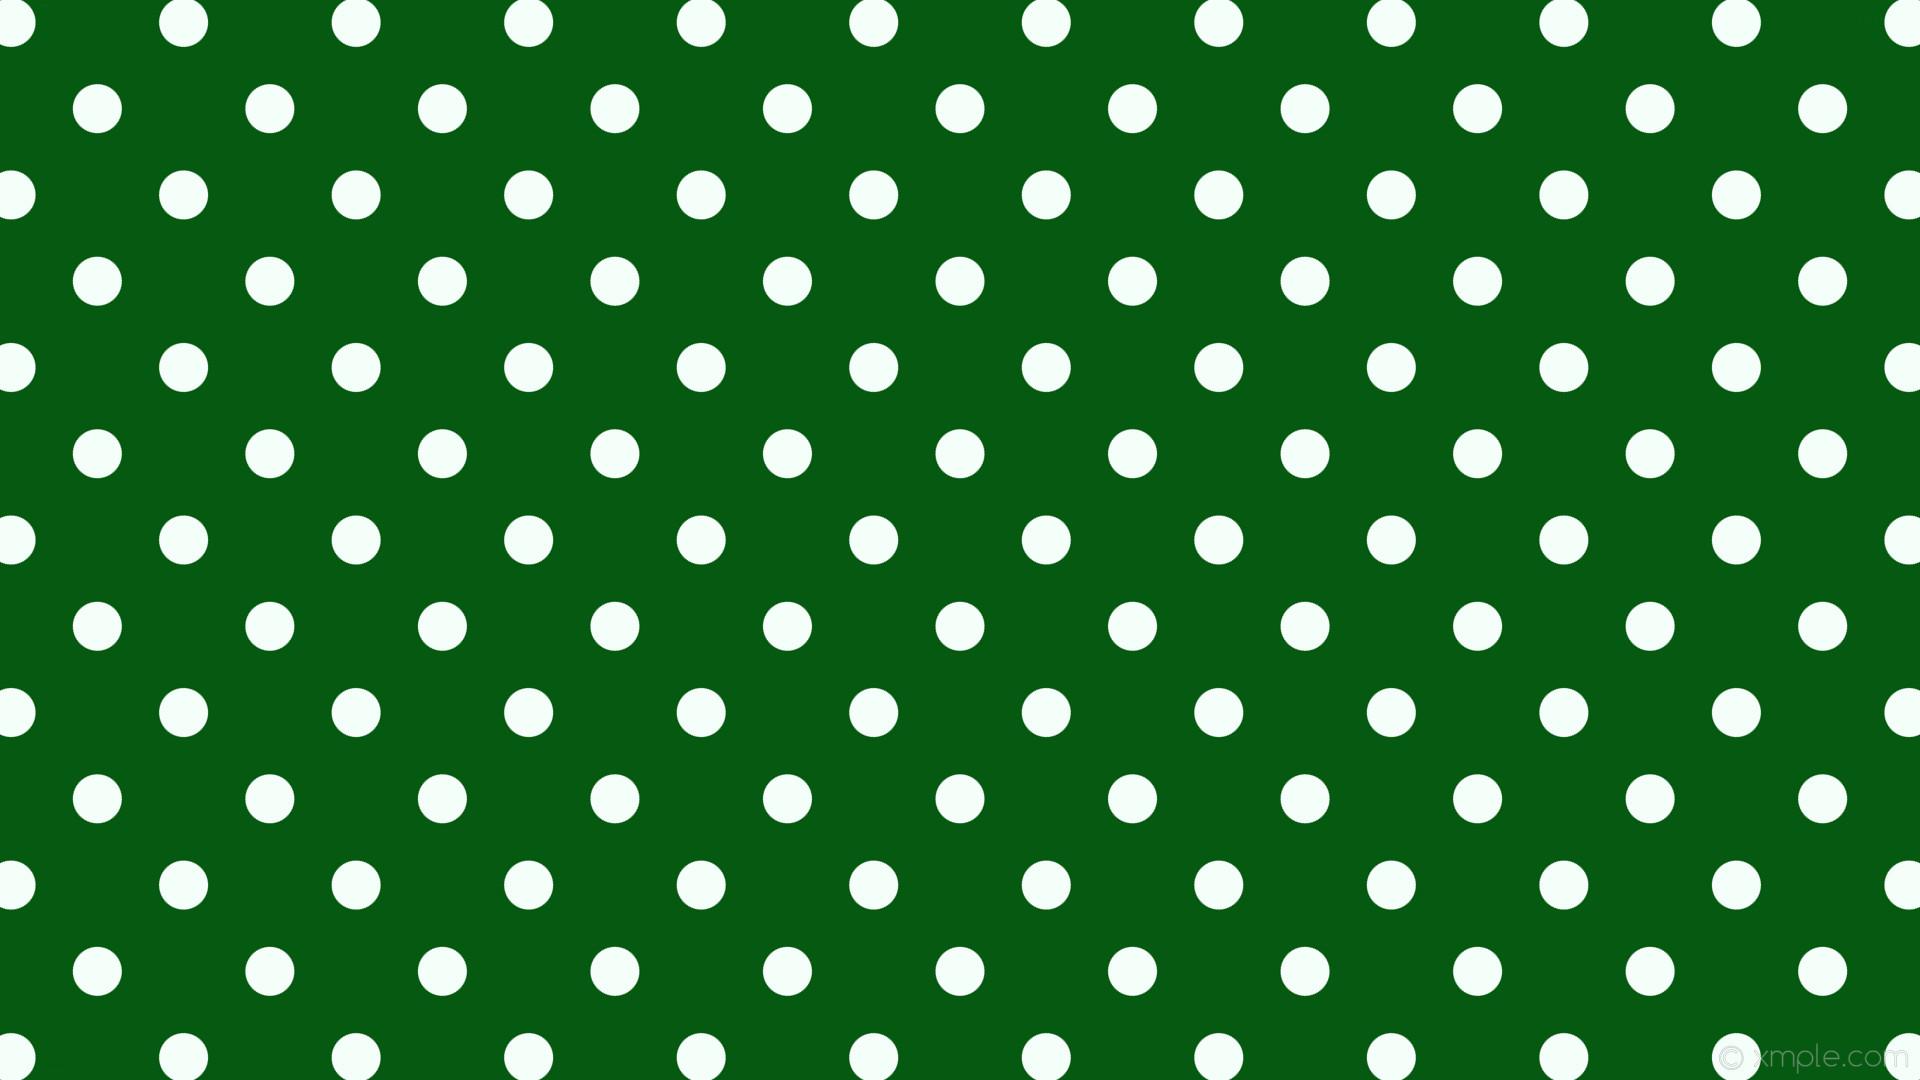 wallpaper spots polka dots green white dark green mint cream #055910  #f5fffa 225°